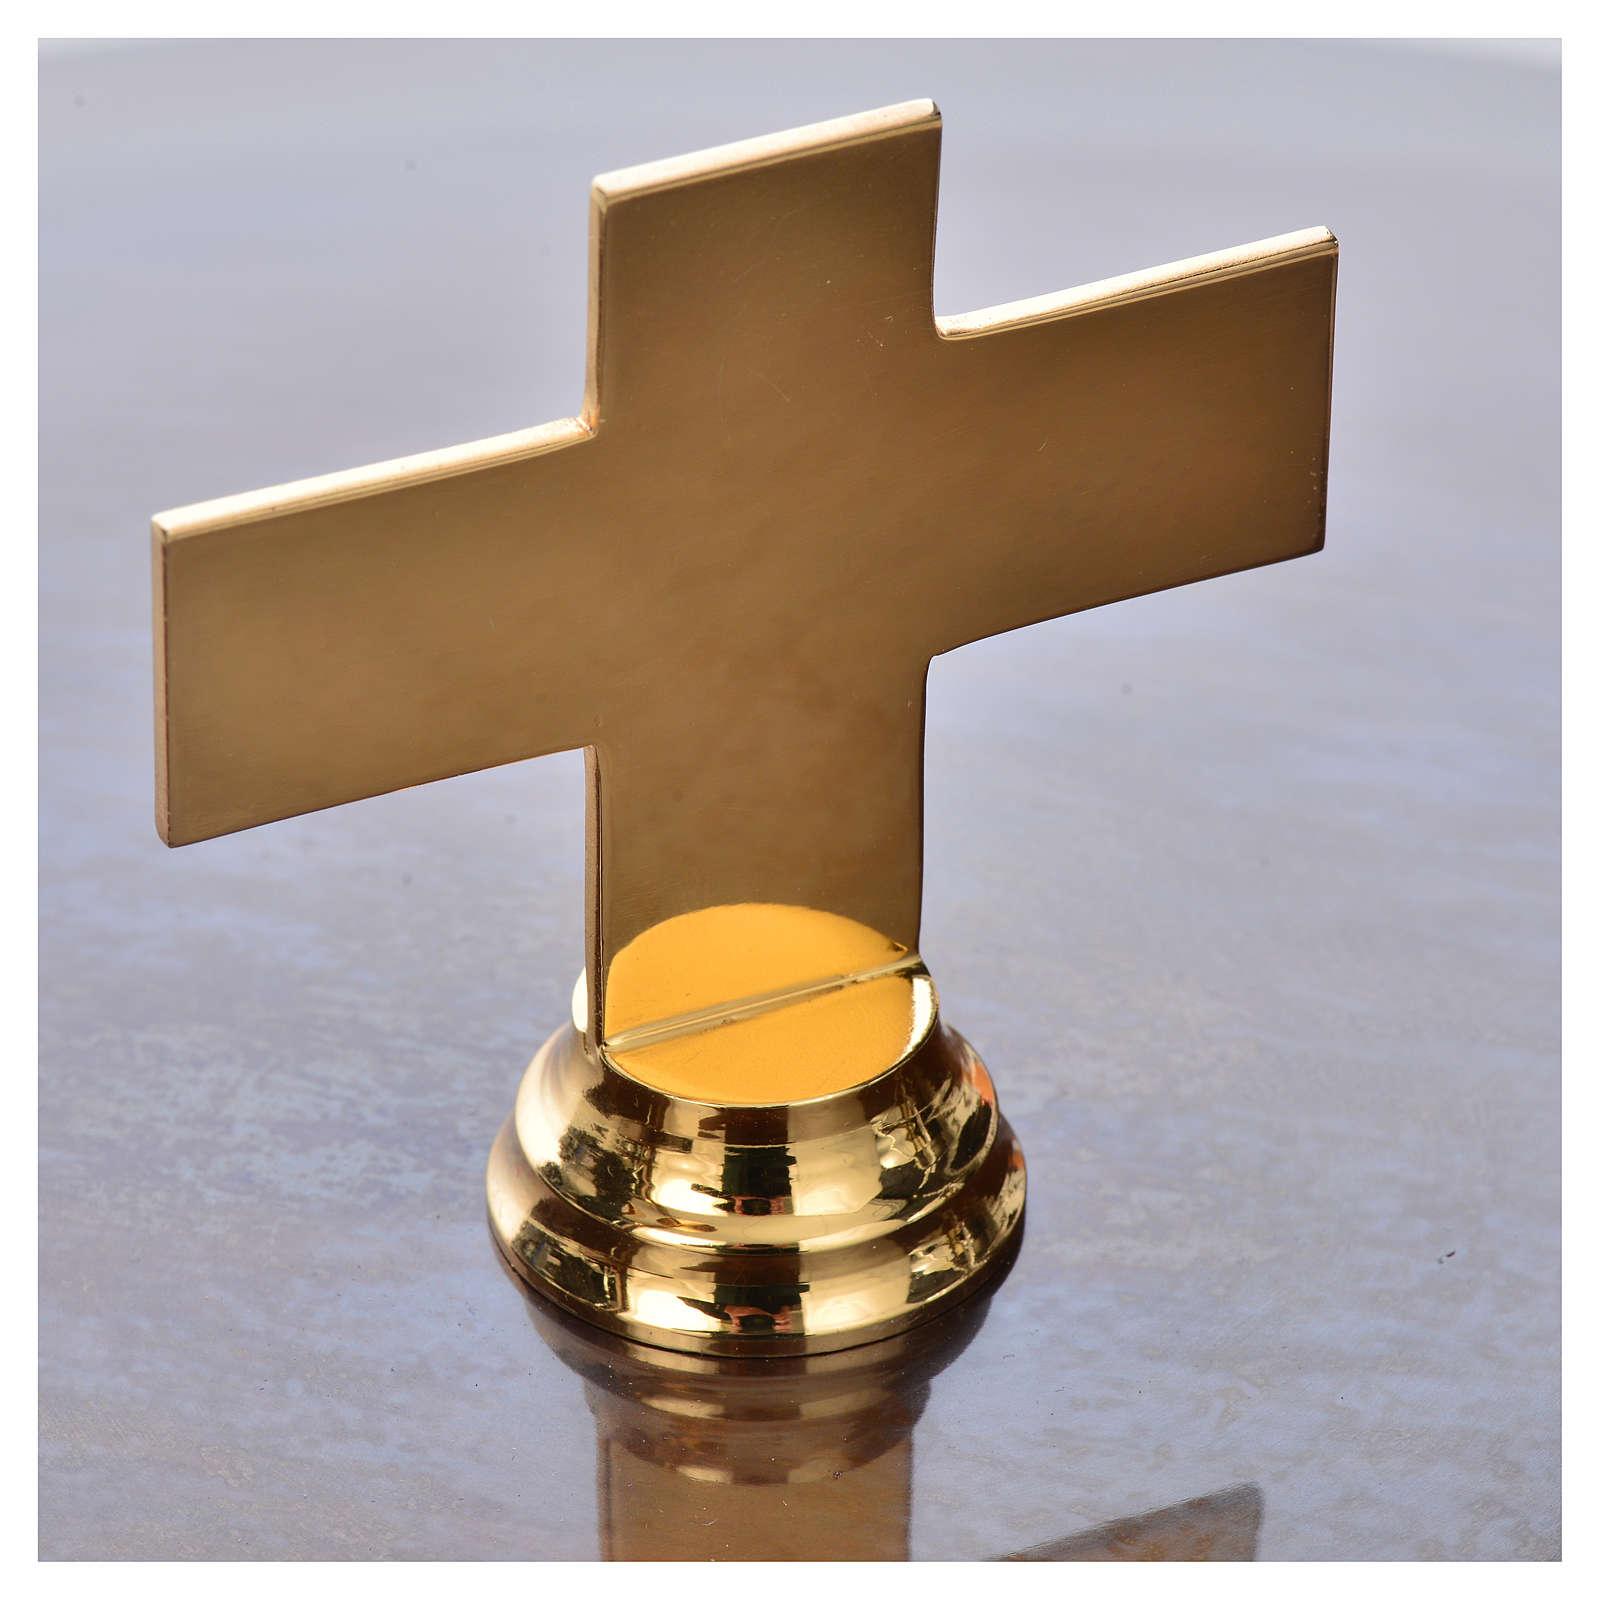 Pila bautismal de latón martillado 4